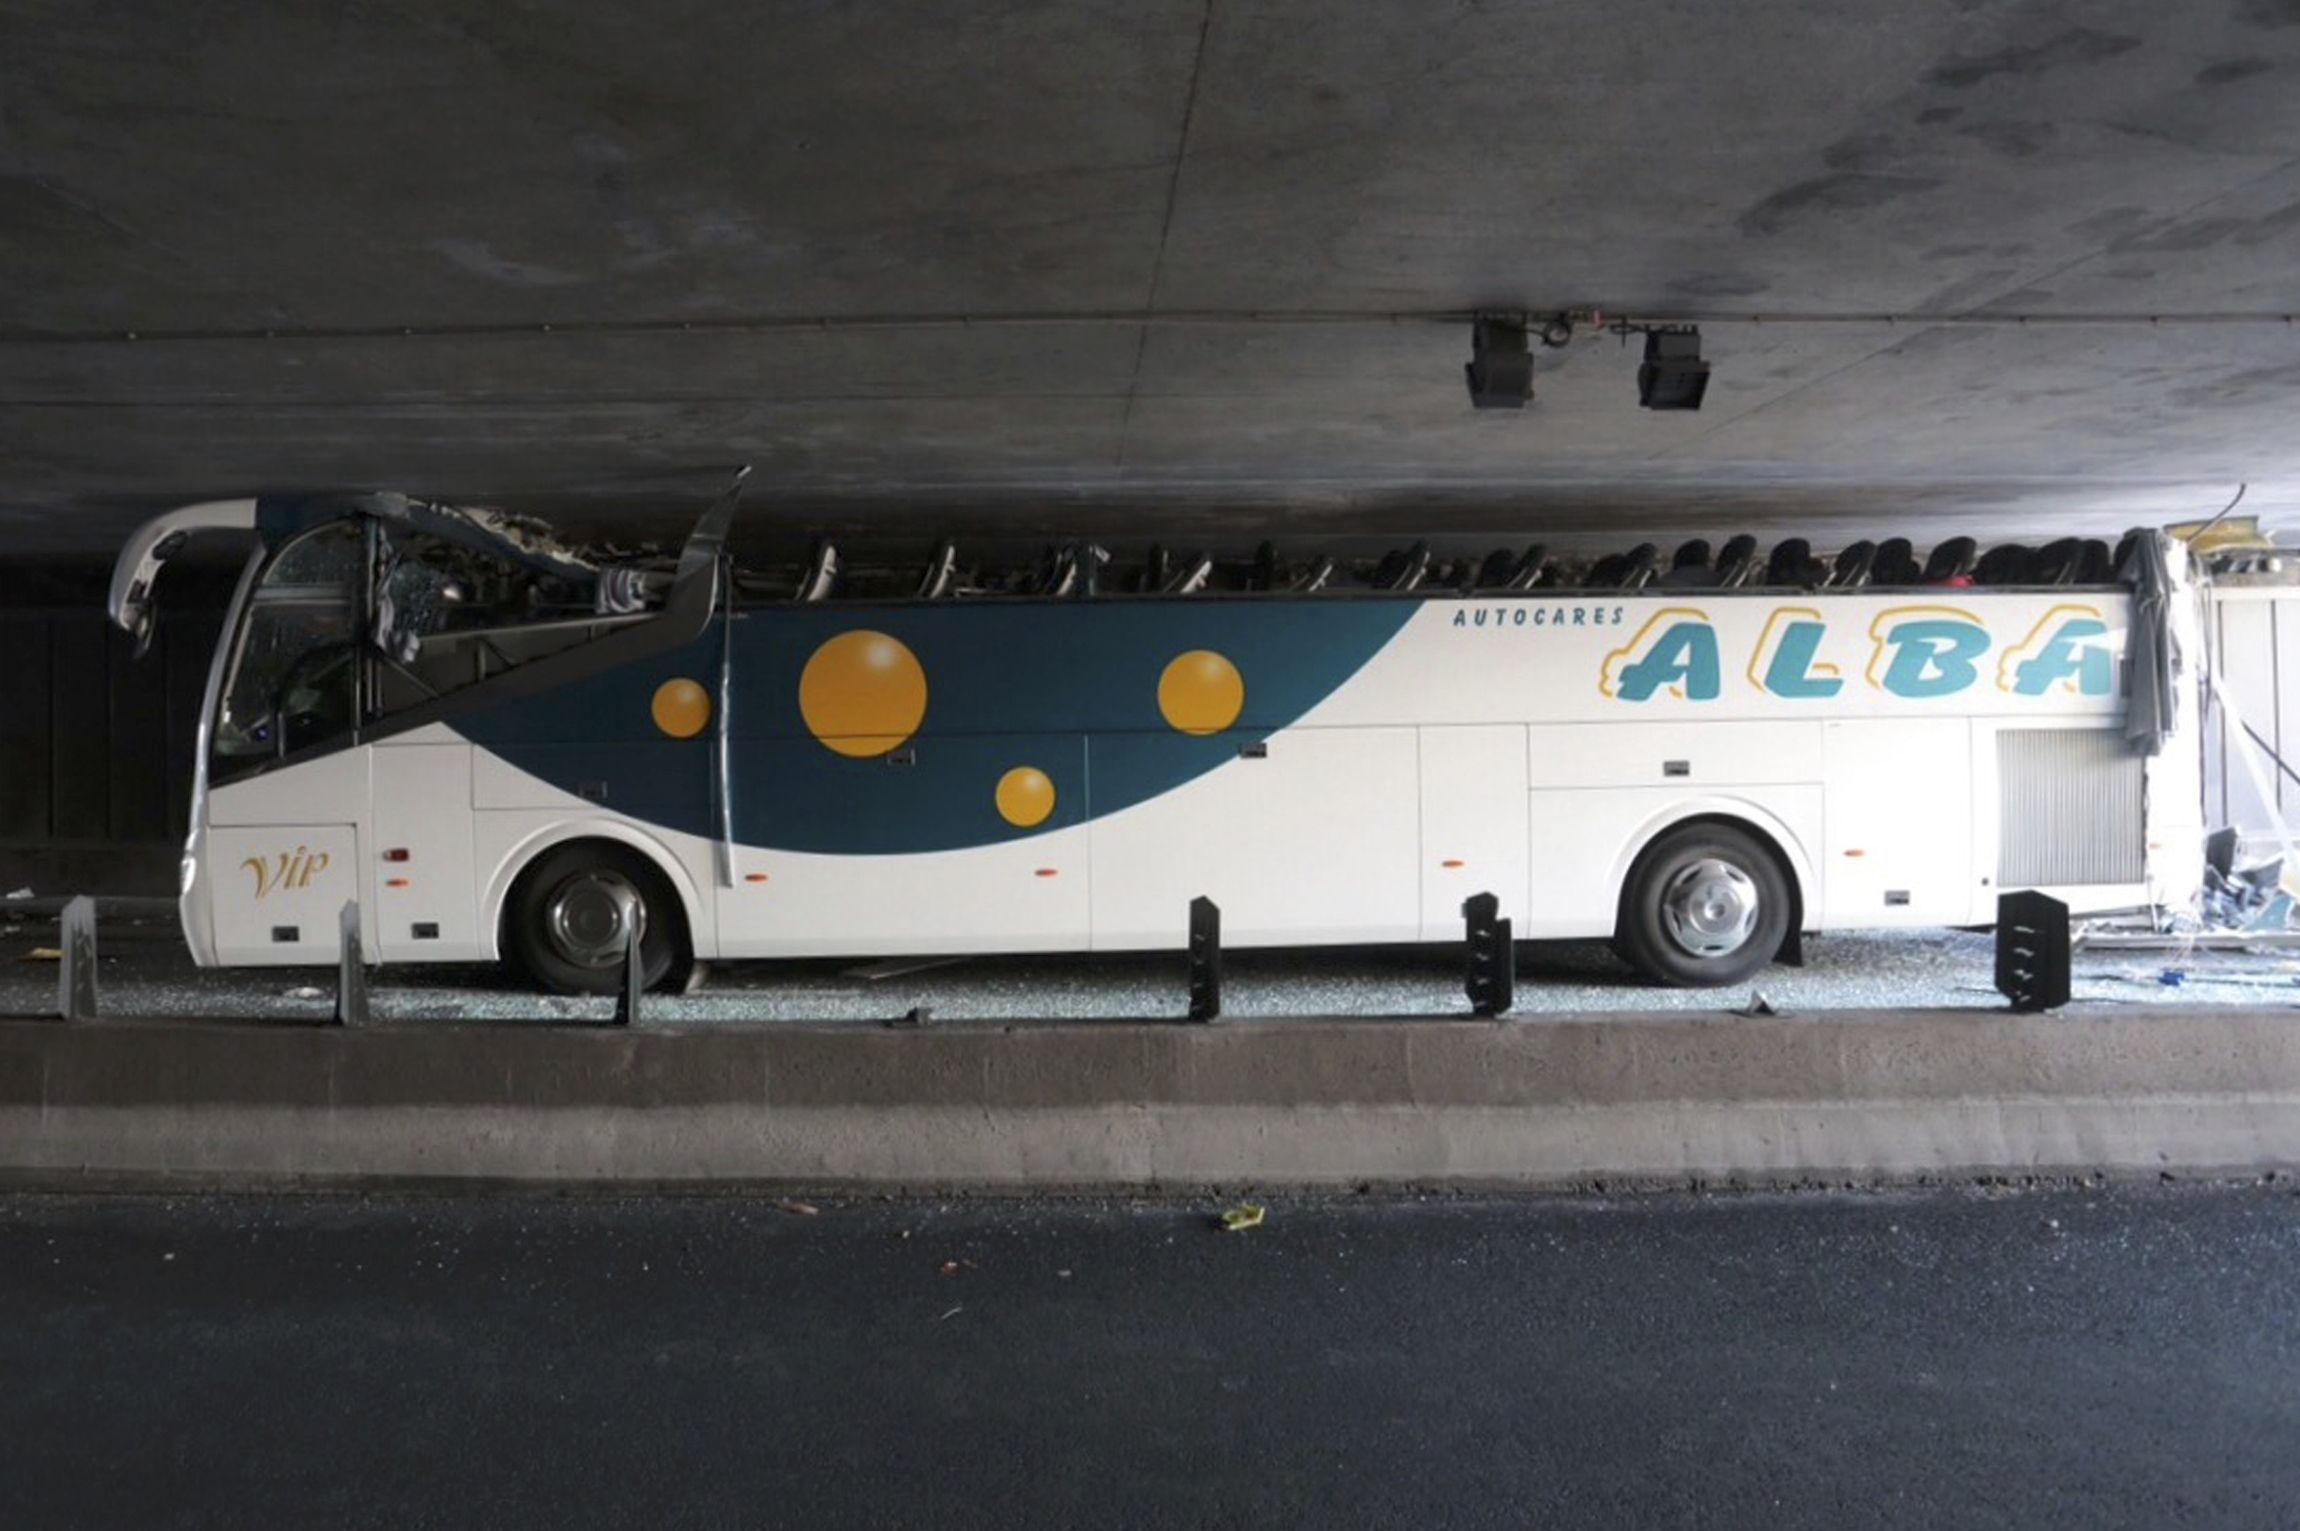 Inexplicable. El impacto arrancó completamente el techo del ómnibus.